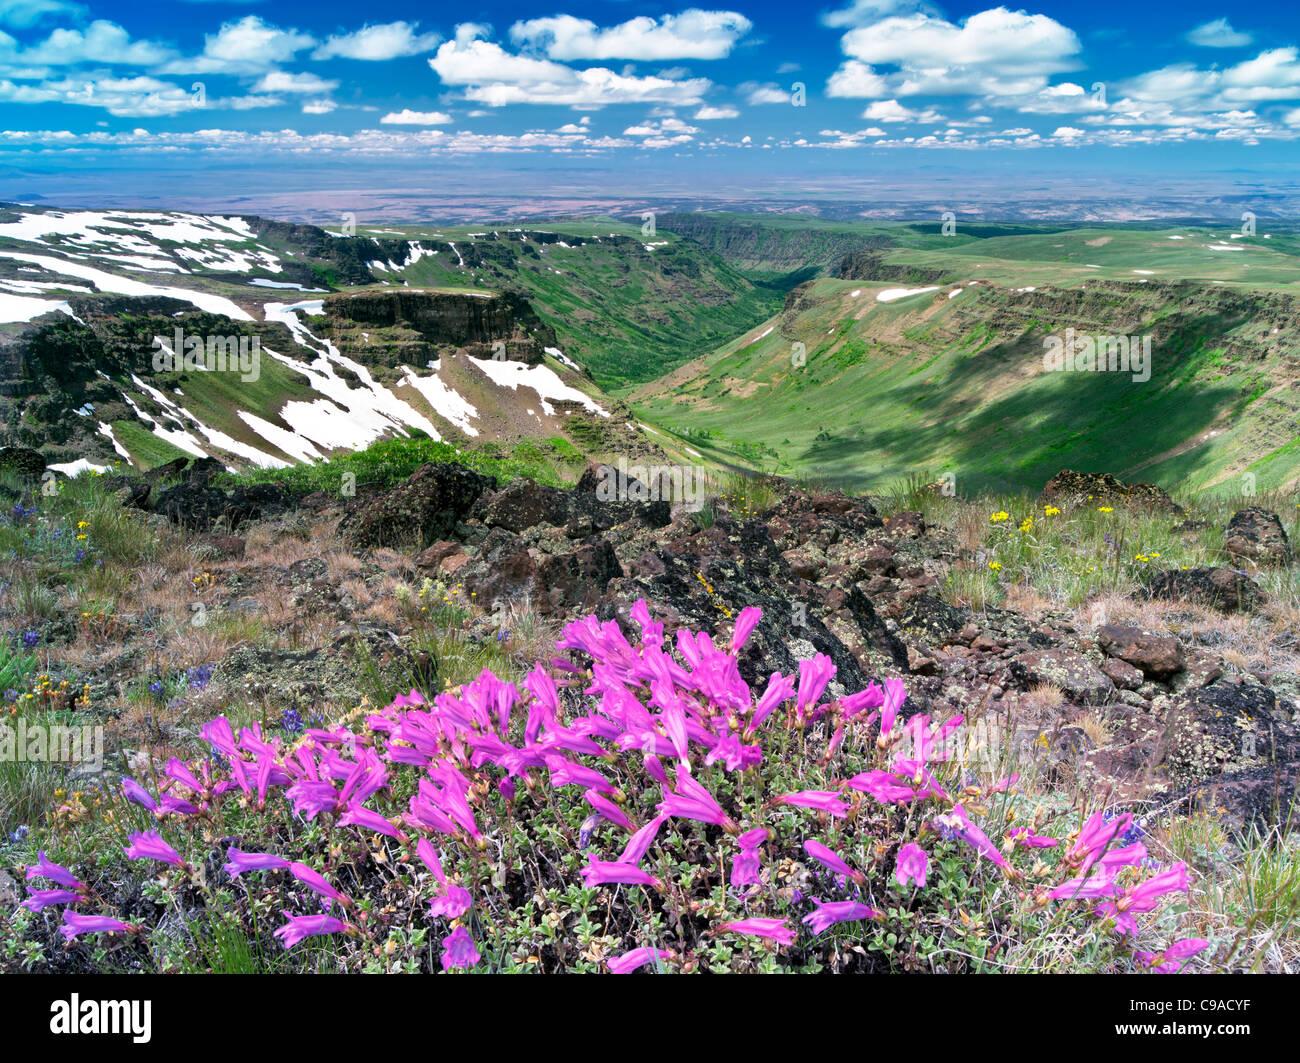 Penstemon and Little Blitzen Gorge. Steens Mountain Wilderness, Oregon - Stock Image